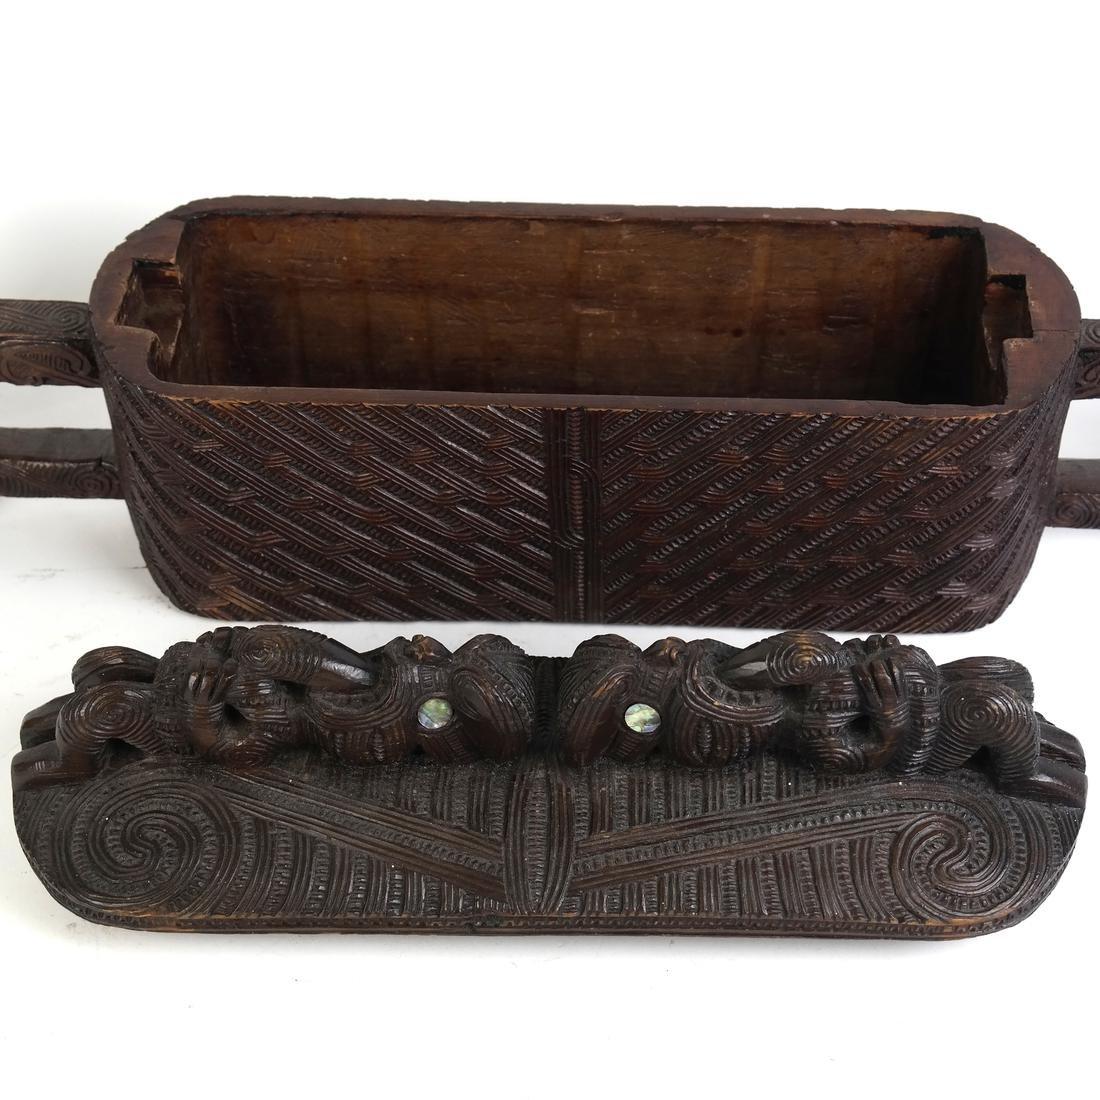 Maori Carved Hardwood Box - 5